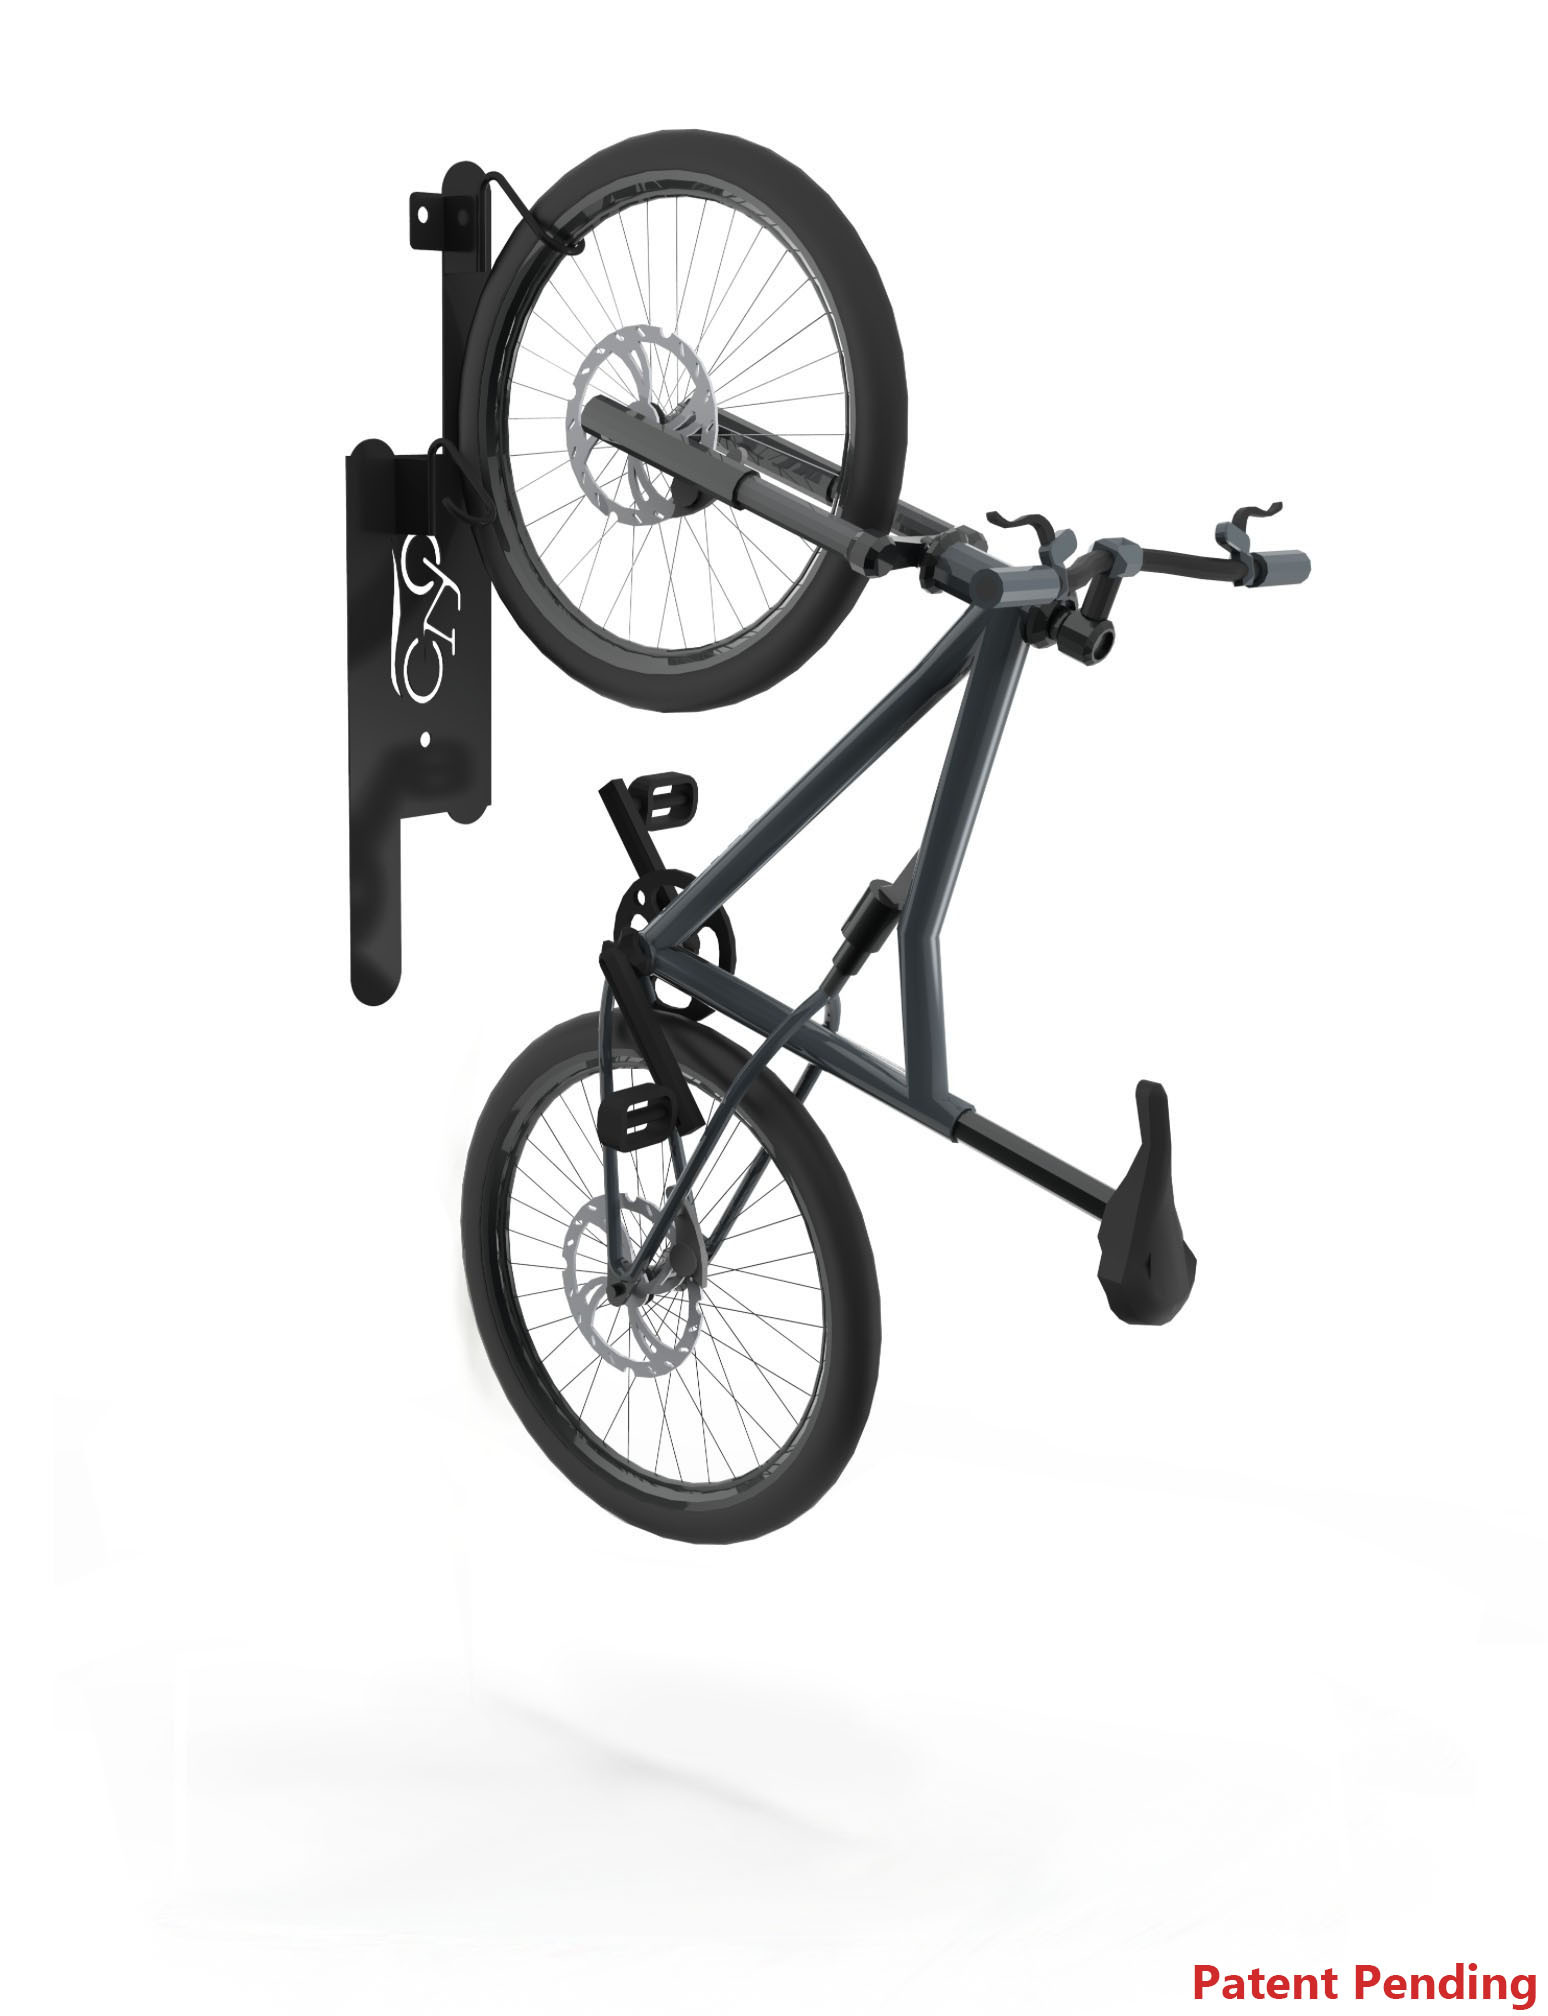 DoubleUp Wall-Mounted Bike Rack - 2 Bikes (Residential - Non-Locking)